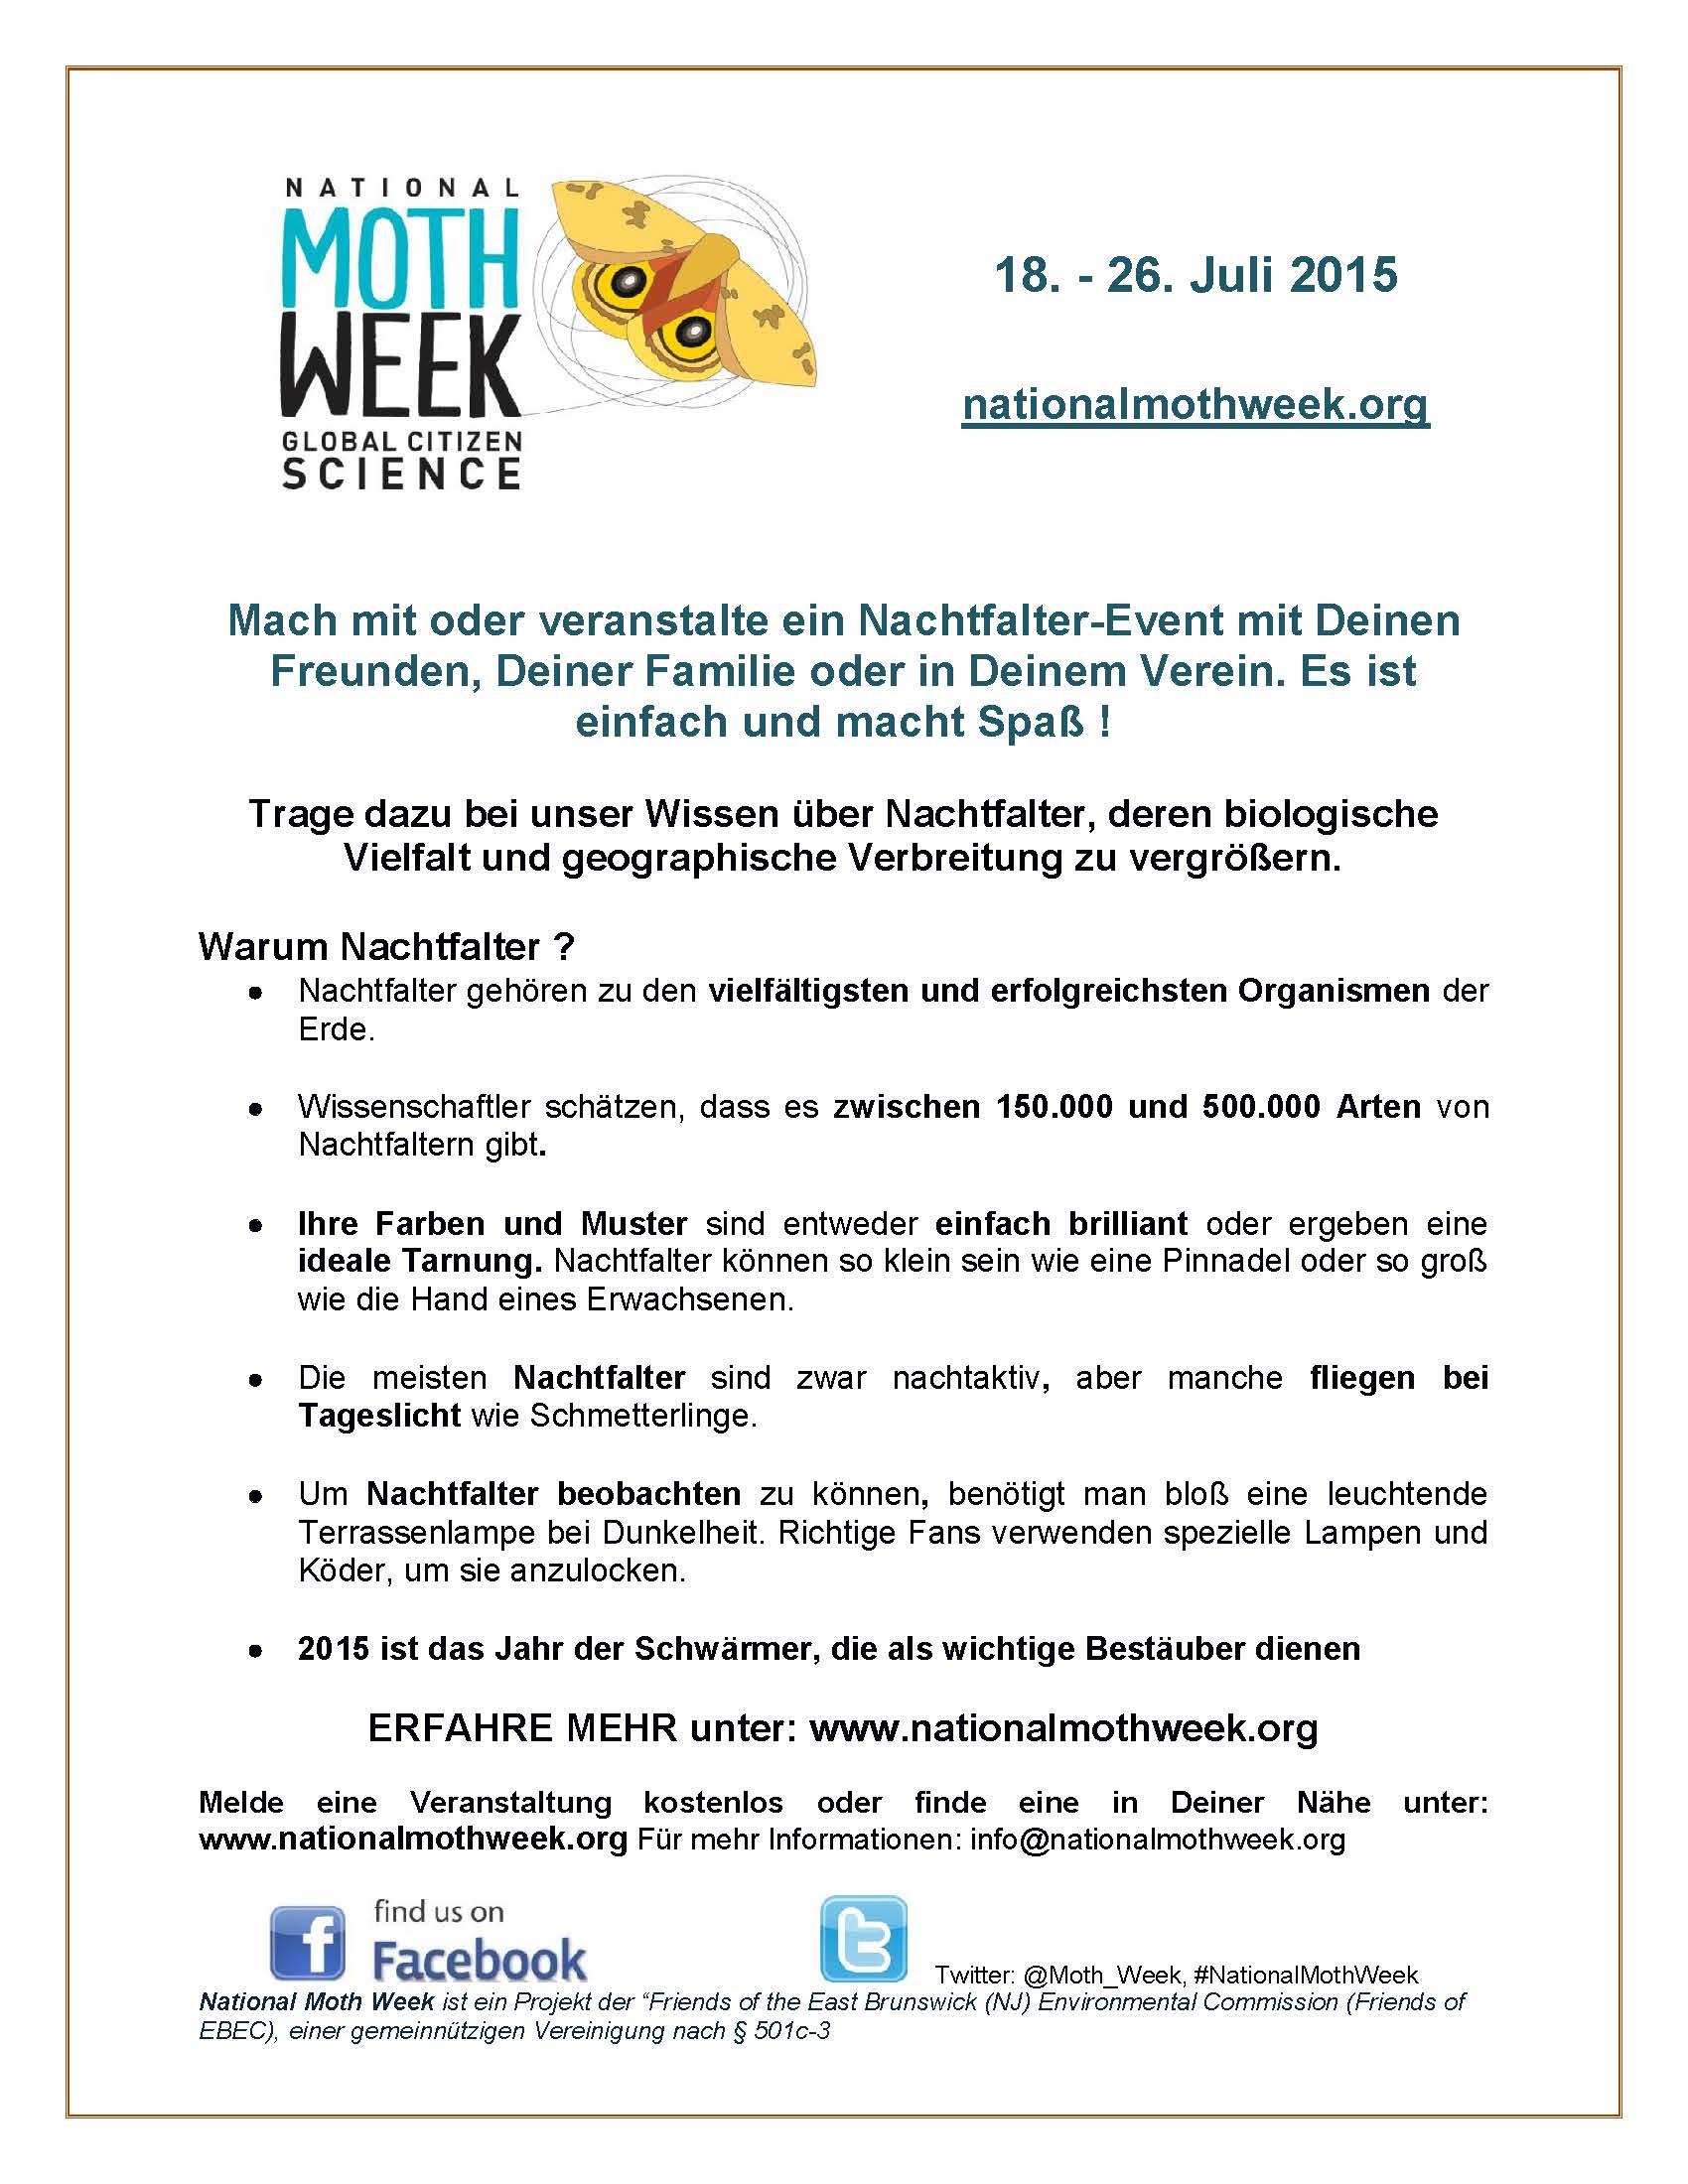 NMW 2015 flyer_German_2